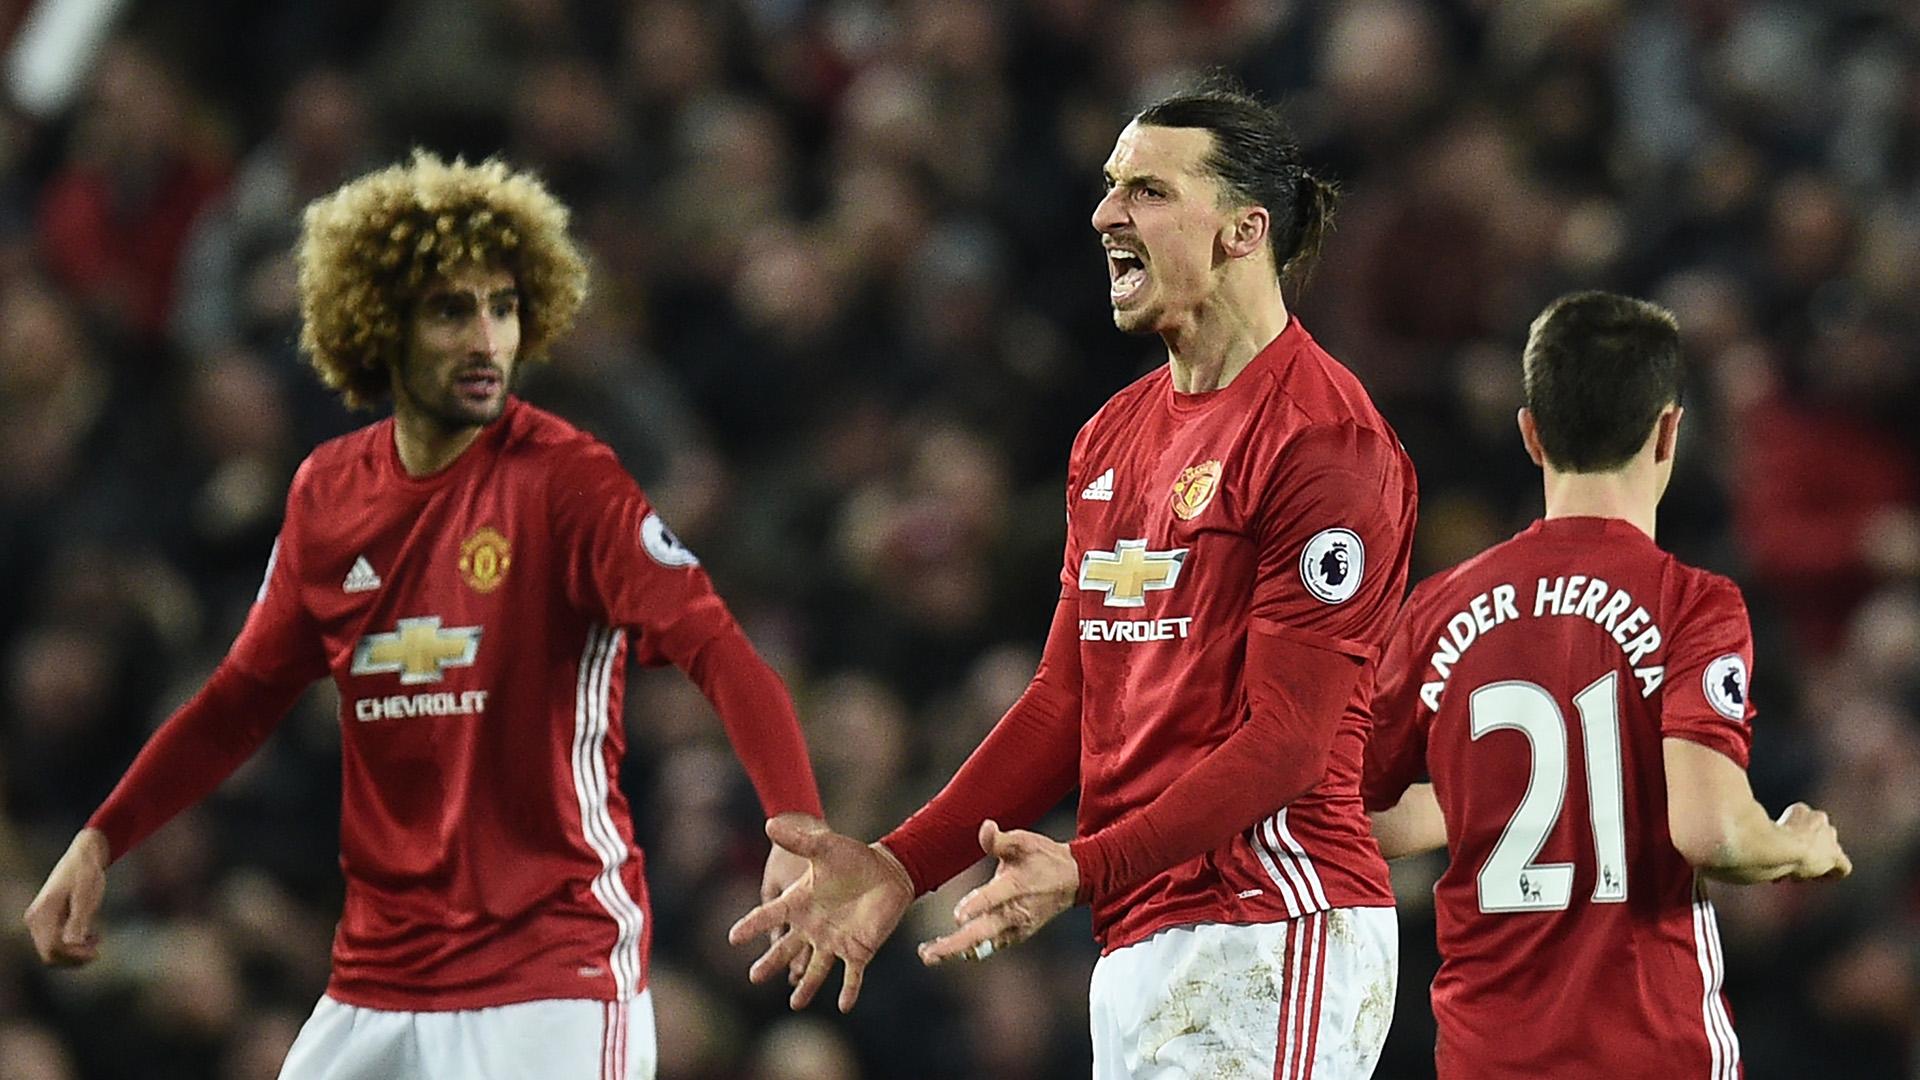 Laporan Pertandingan Manchester United 1 1 Liverpool